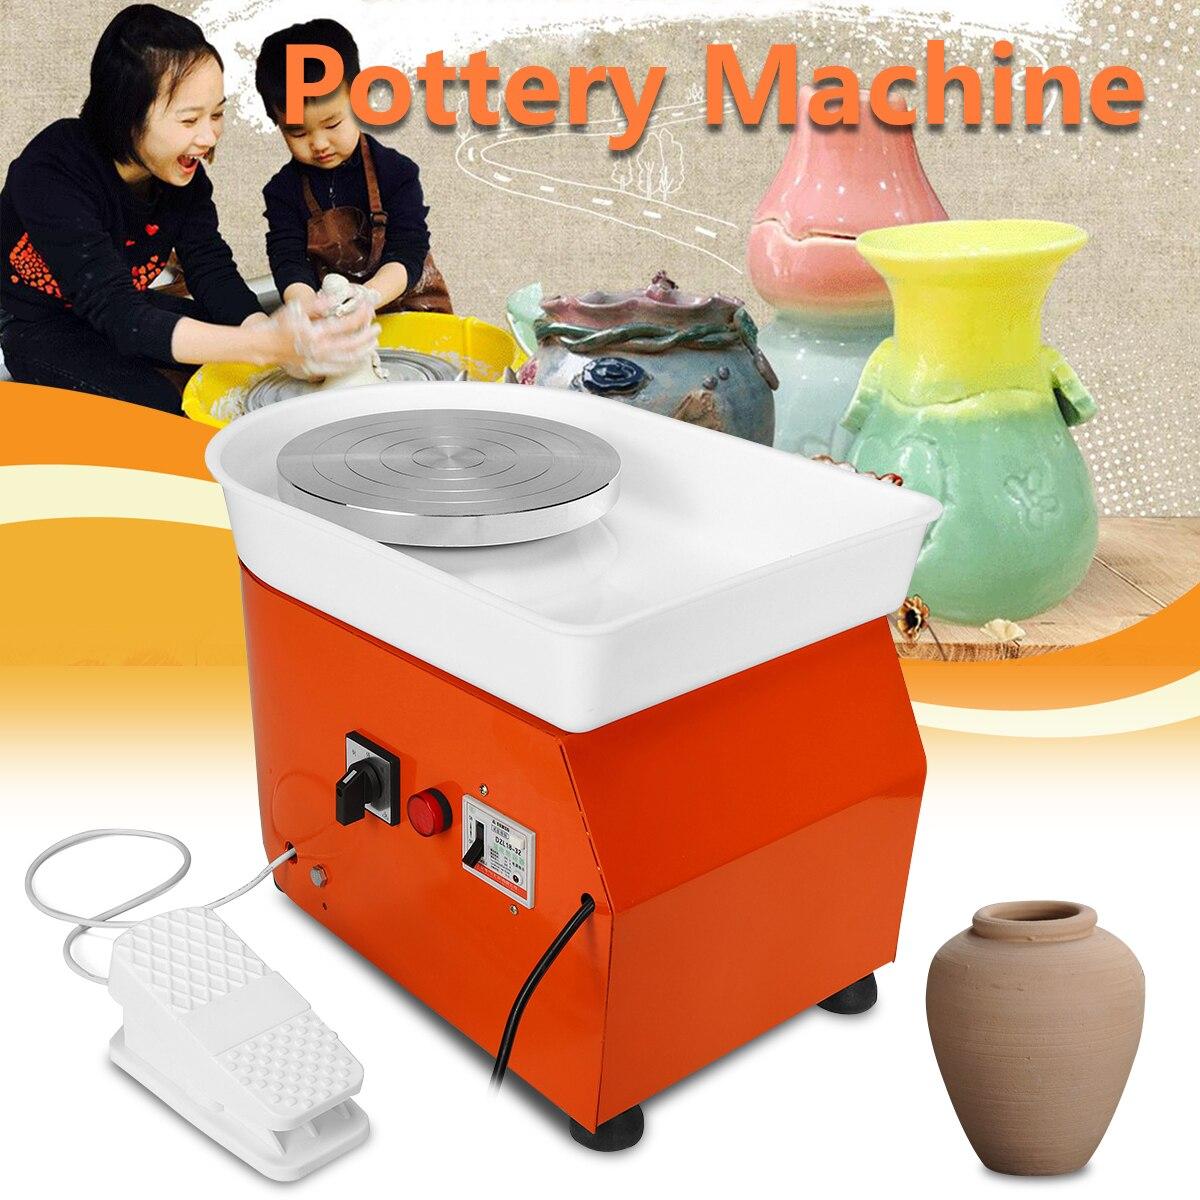 Flexible Foot Pedal Pottery Wheel Machine 25cm AC 220V 250W Ceramic Work Ceramics Clay Art EU/AU/US With Mobile Smooth Low Noise